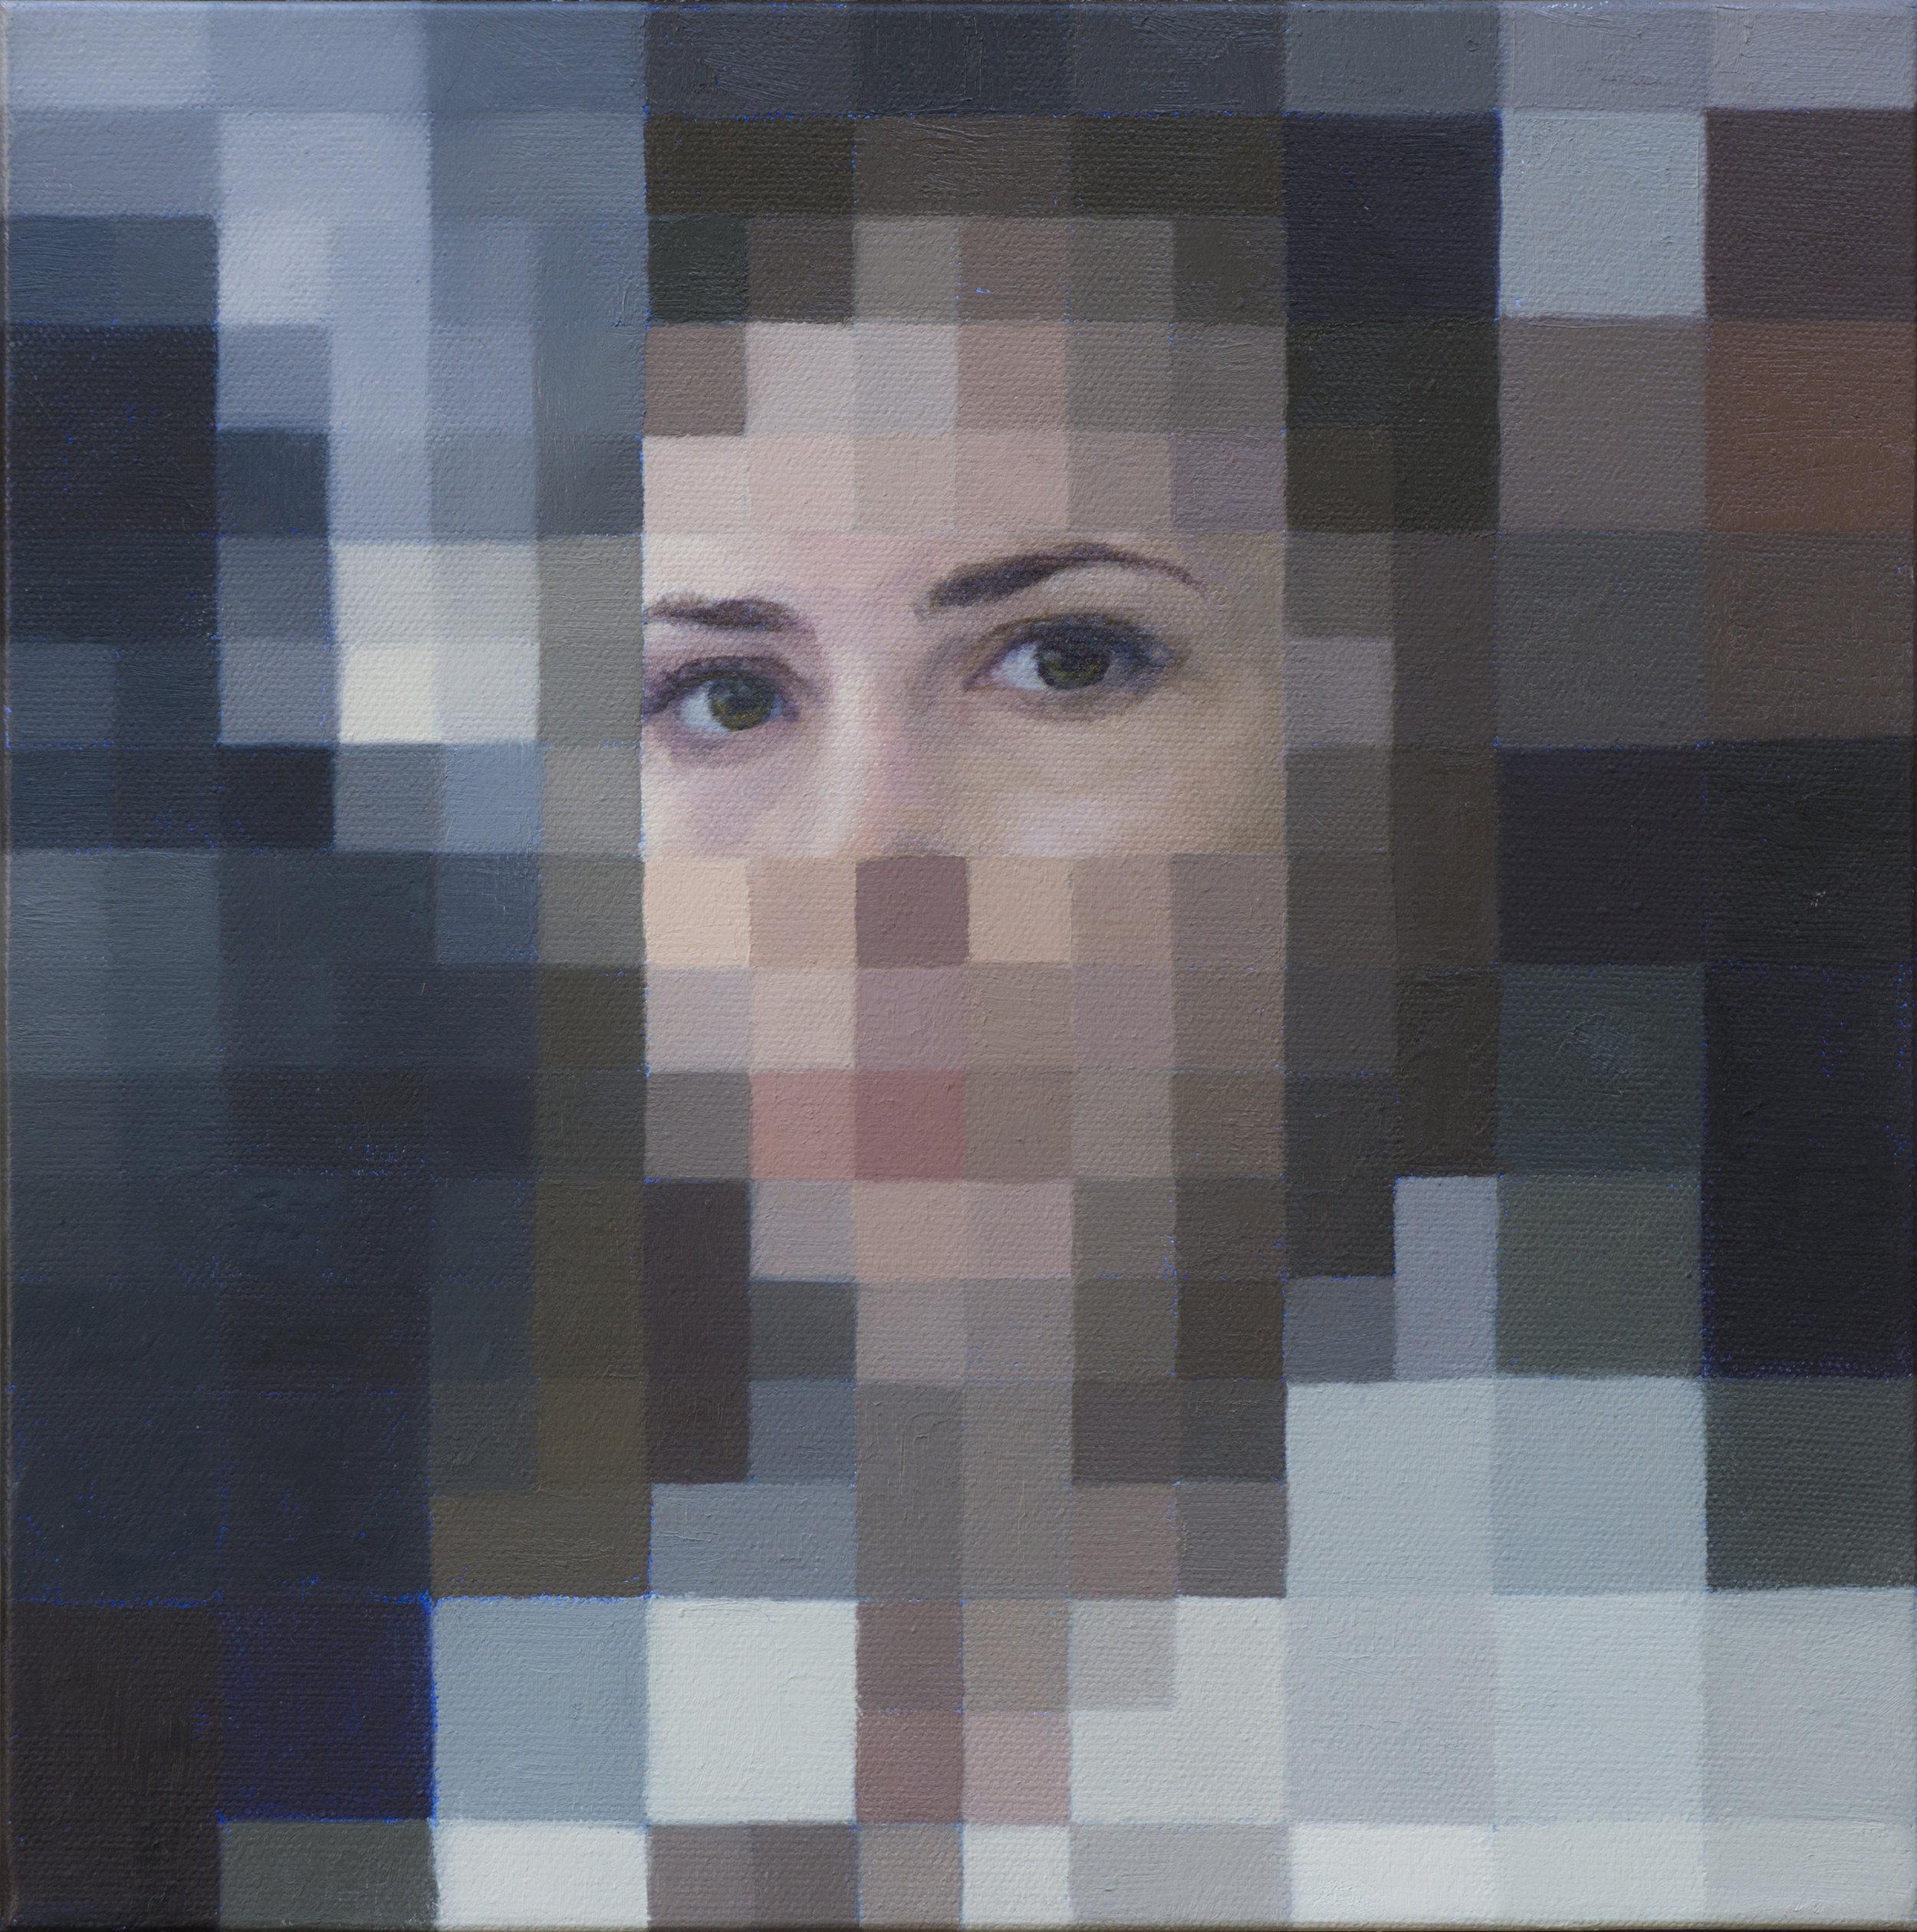 "Digital Personas:  Relationship Dynamics 12"" x 12"" oil on canvas. 2108"